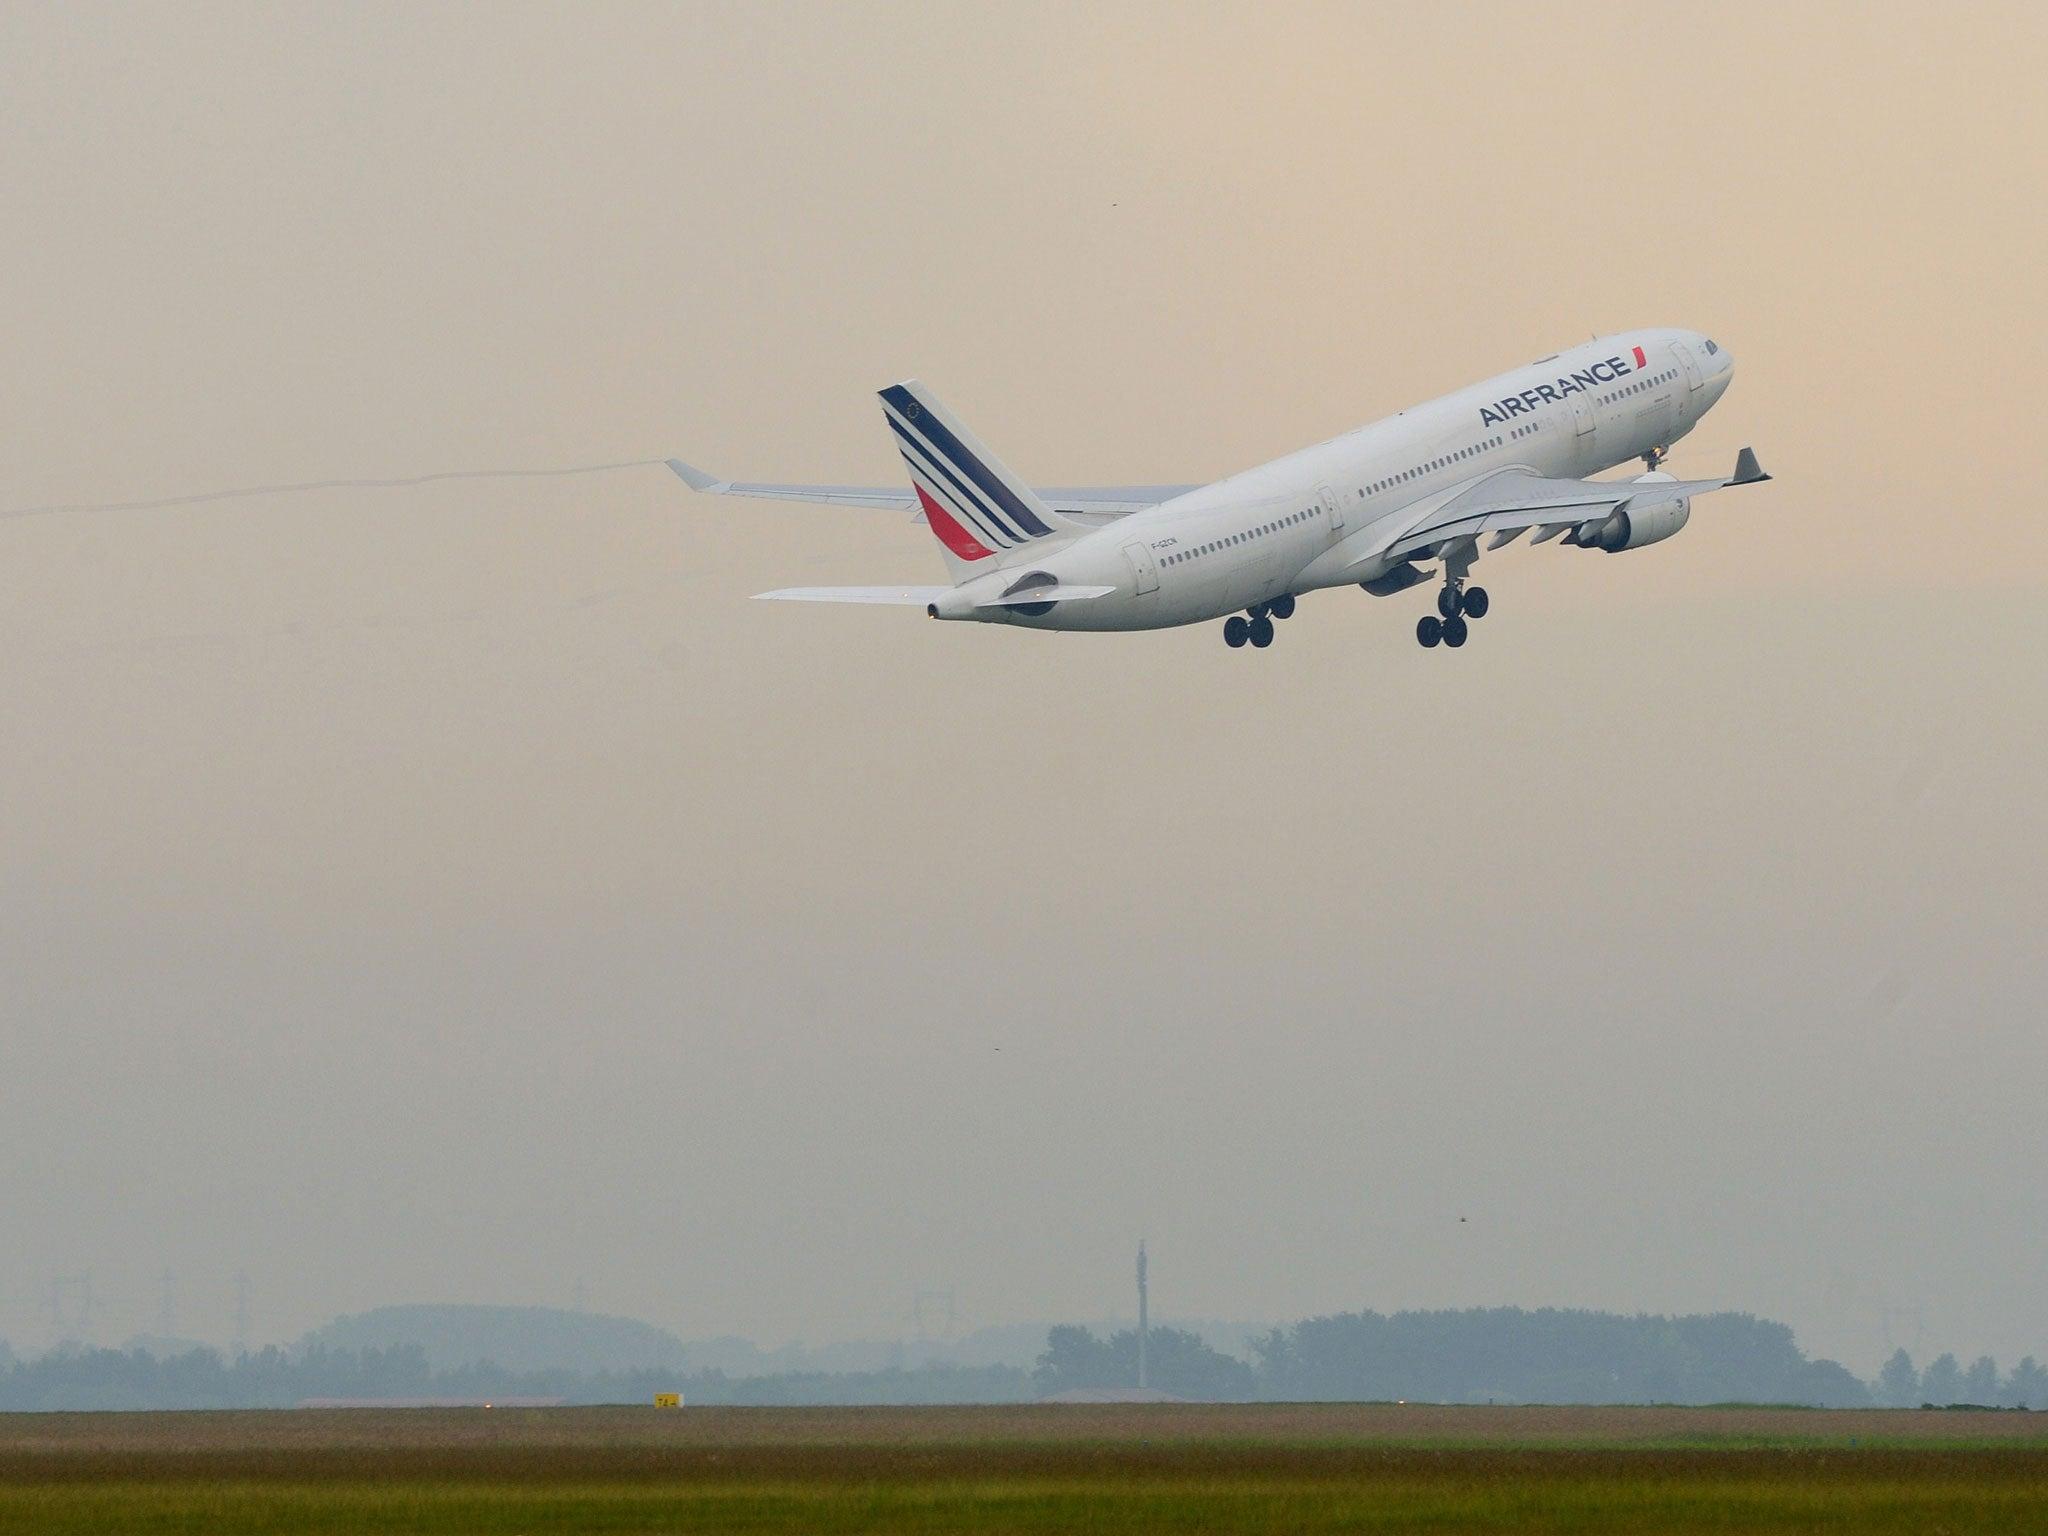 Air france wreckage photos